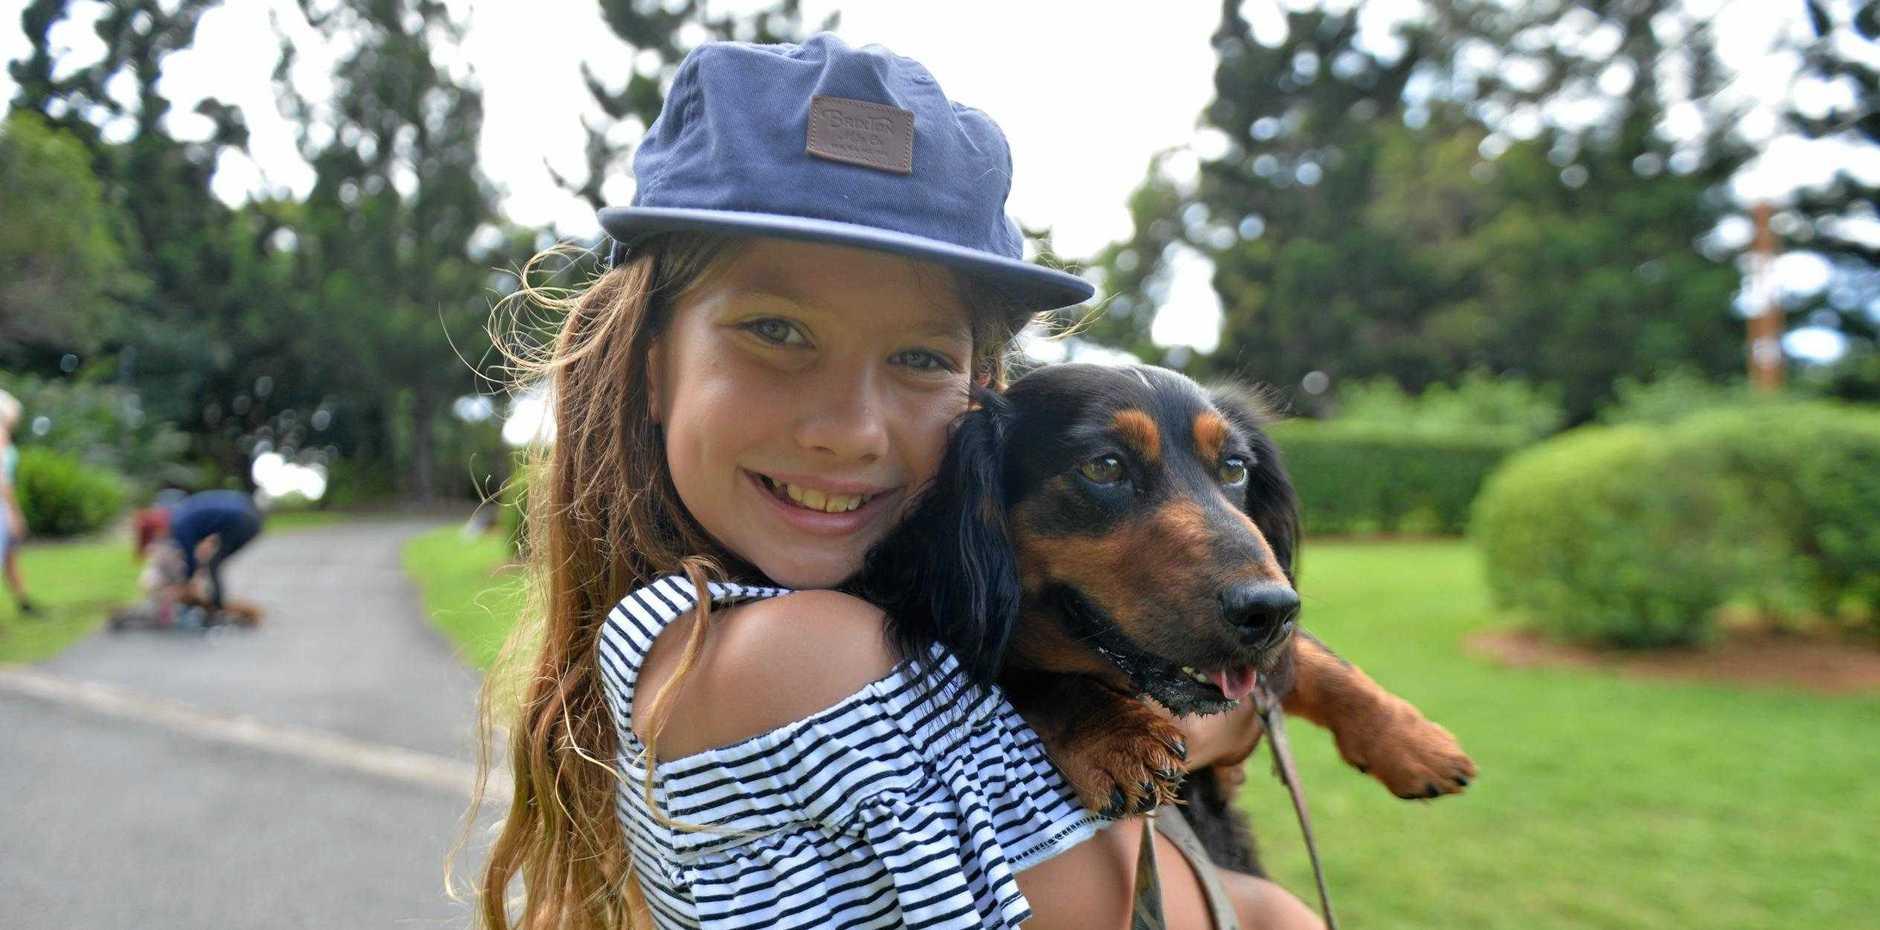 Ruby Galletly-Hope with Franky the dachshund at Mackay Regional Botanic Gardens.